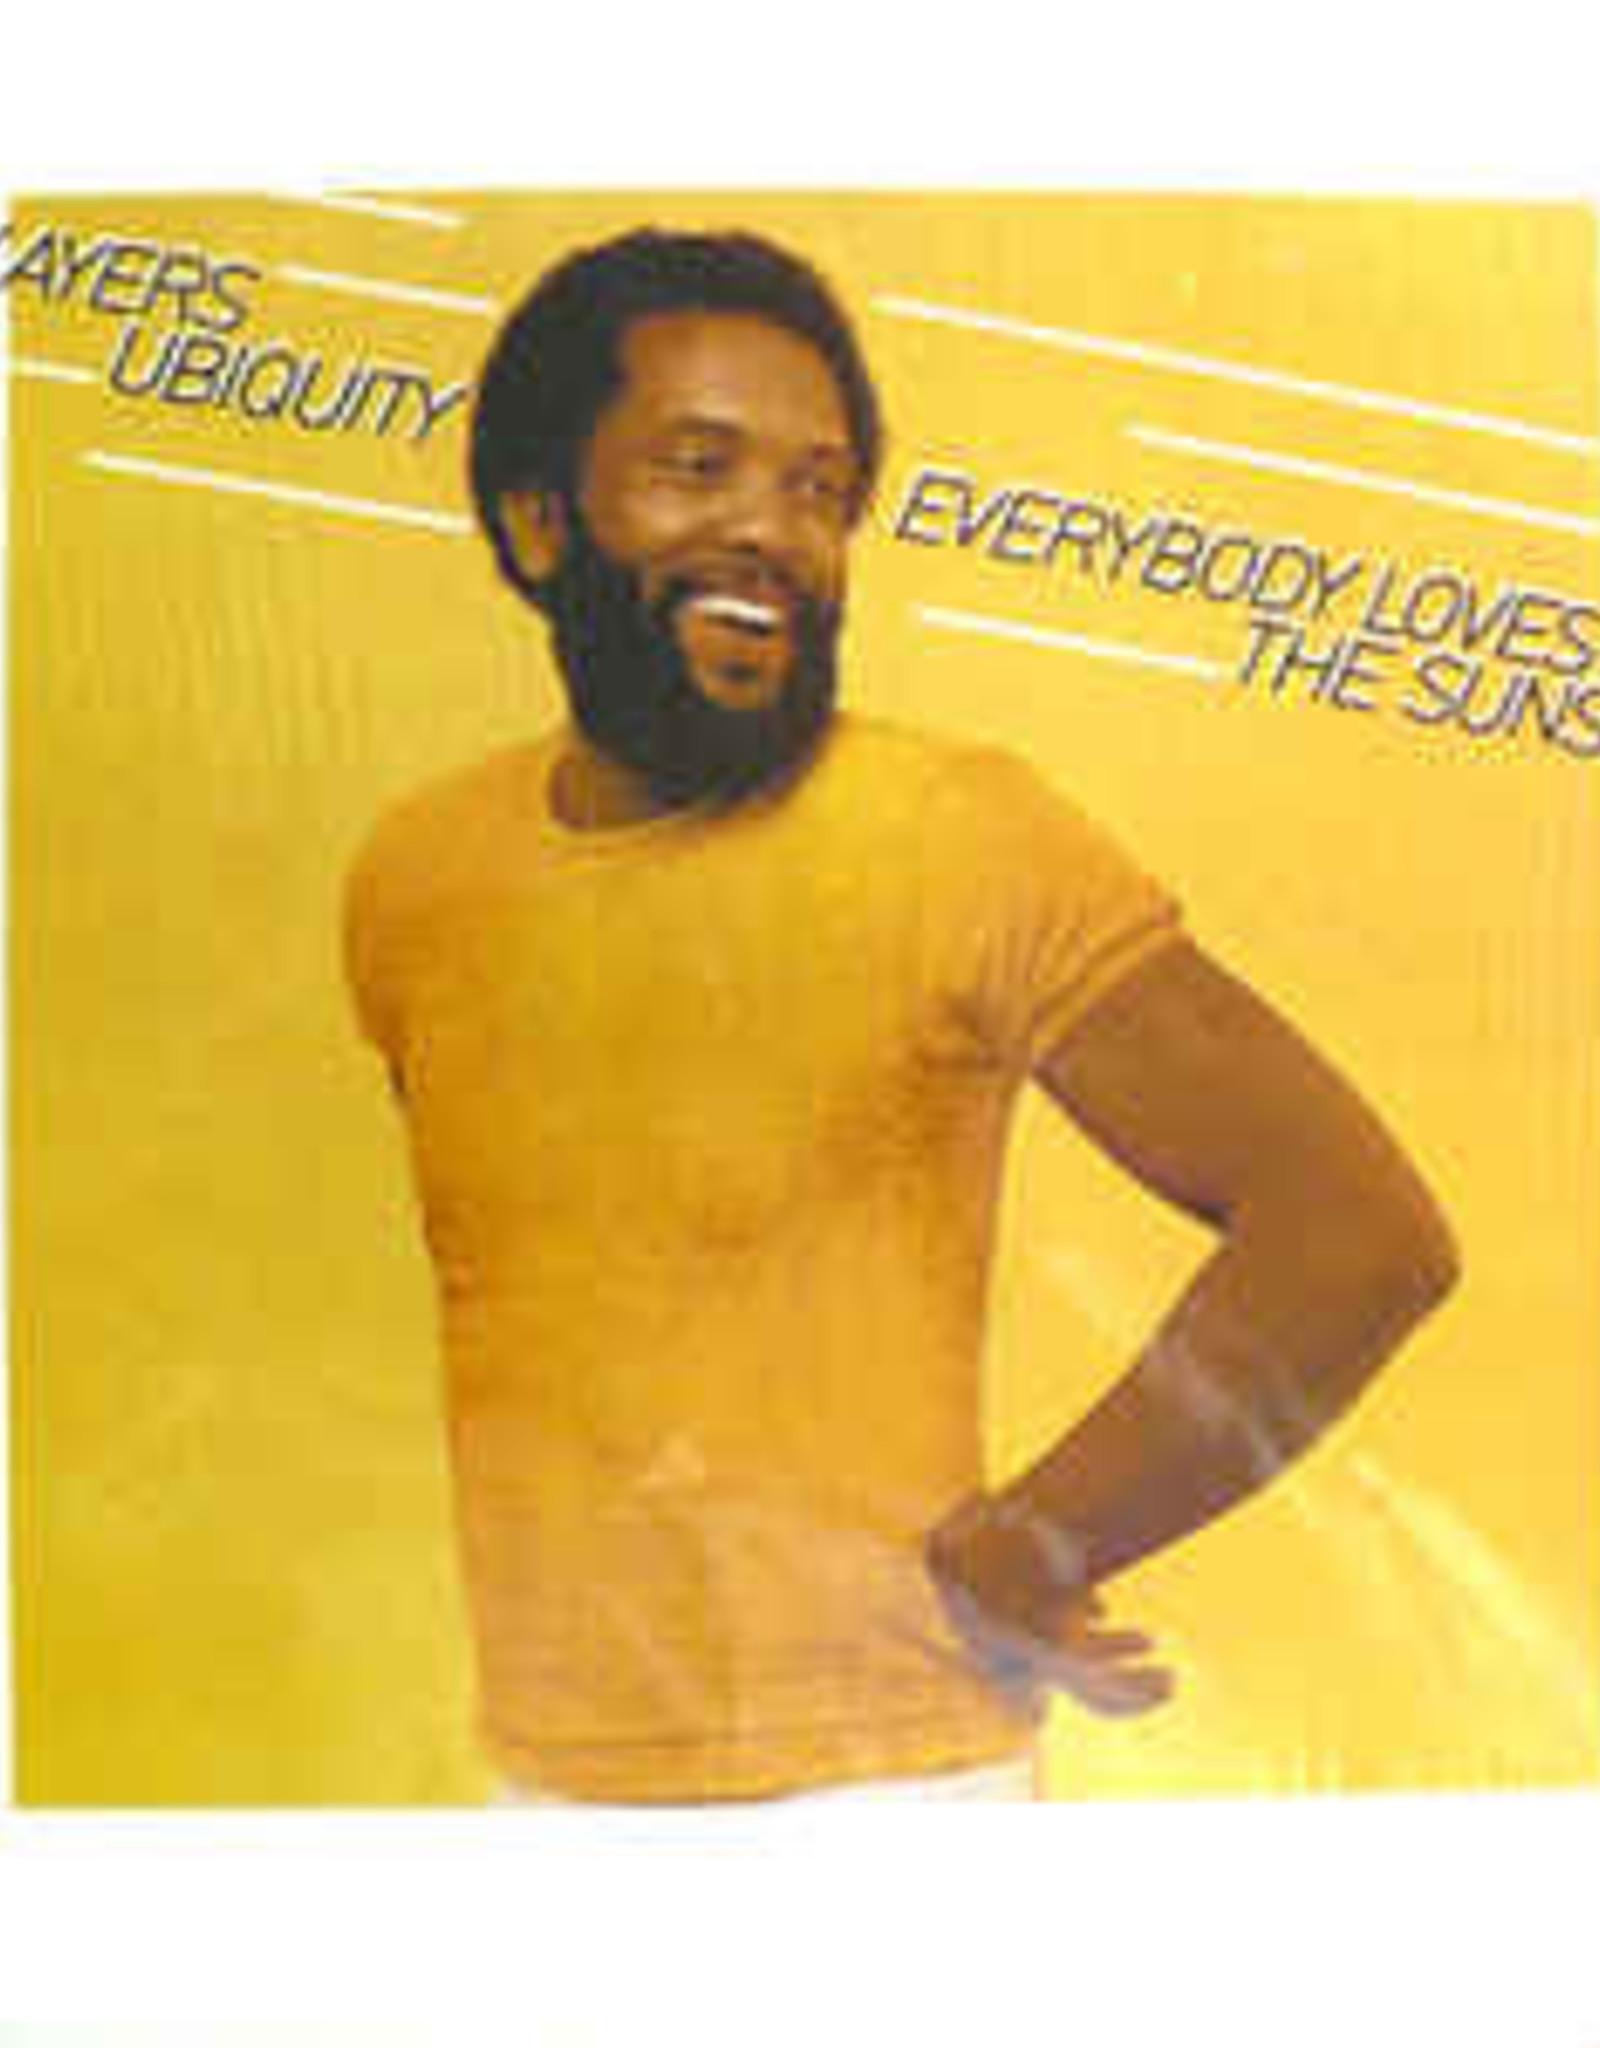 Roy Ayers - Everybody Loves The Sunshine